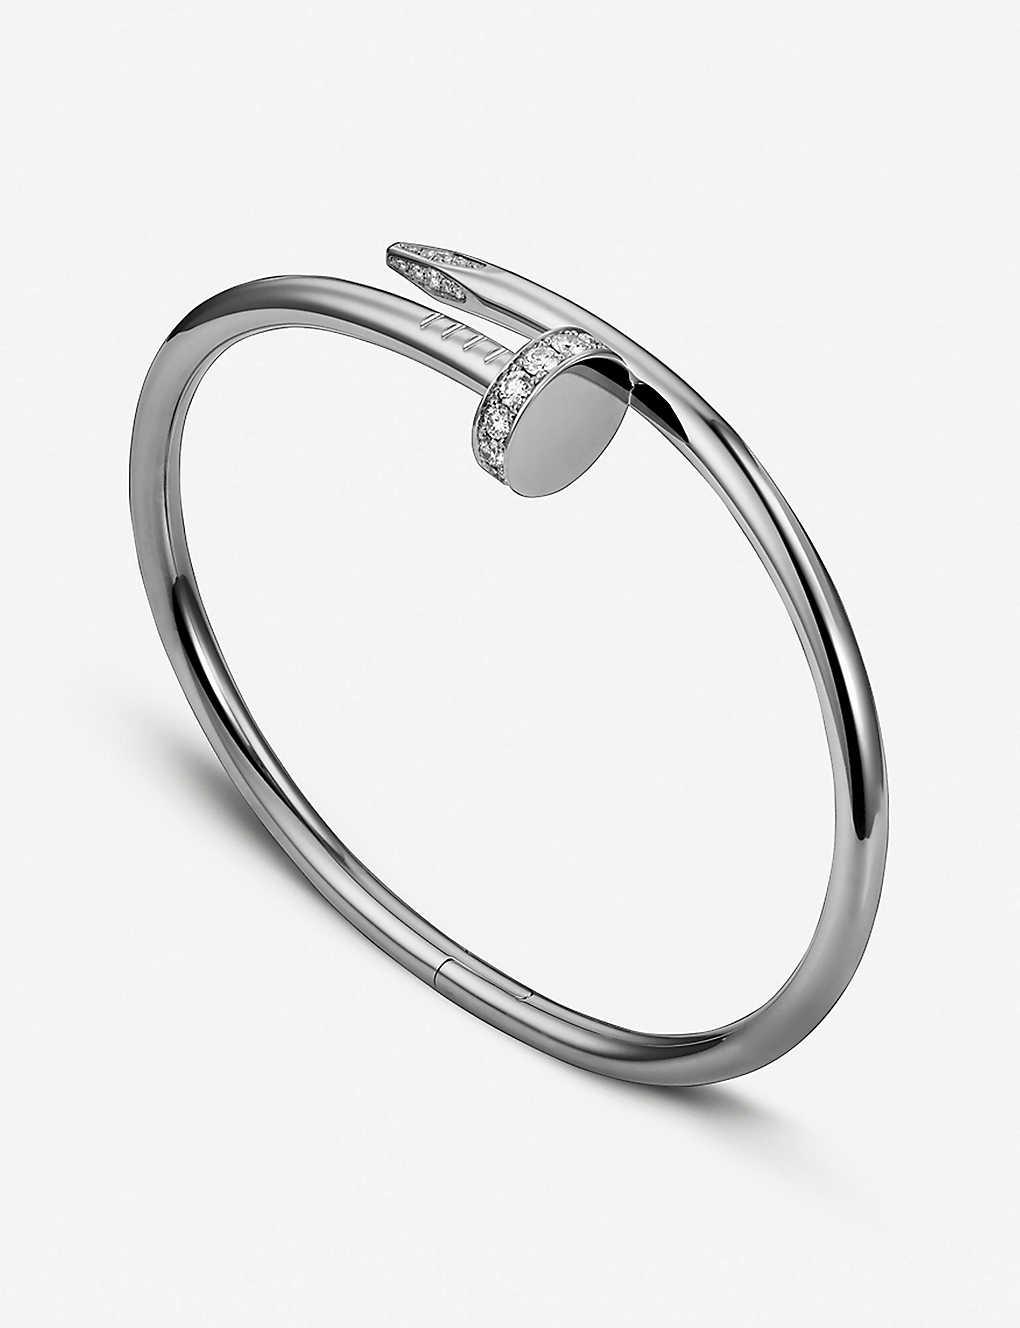 39b9831140132 Juste un Clou 18ct white-gold and diamond bracelet